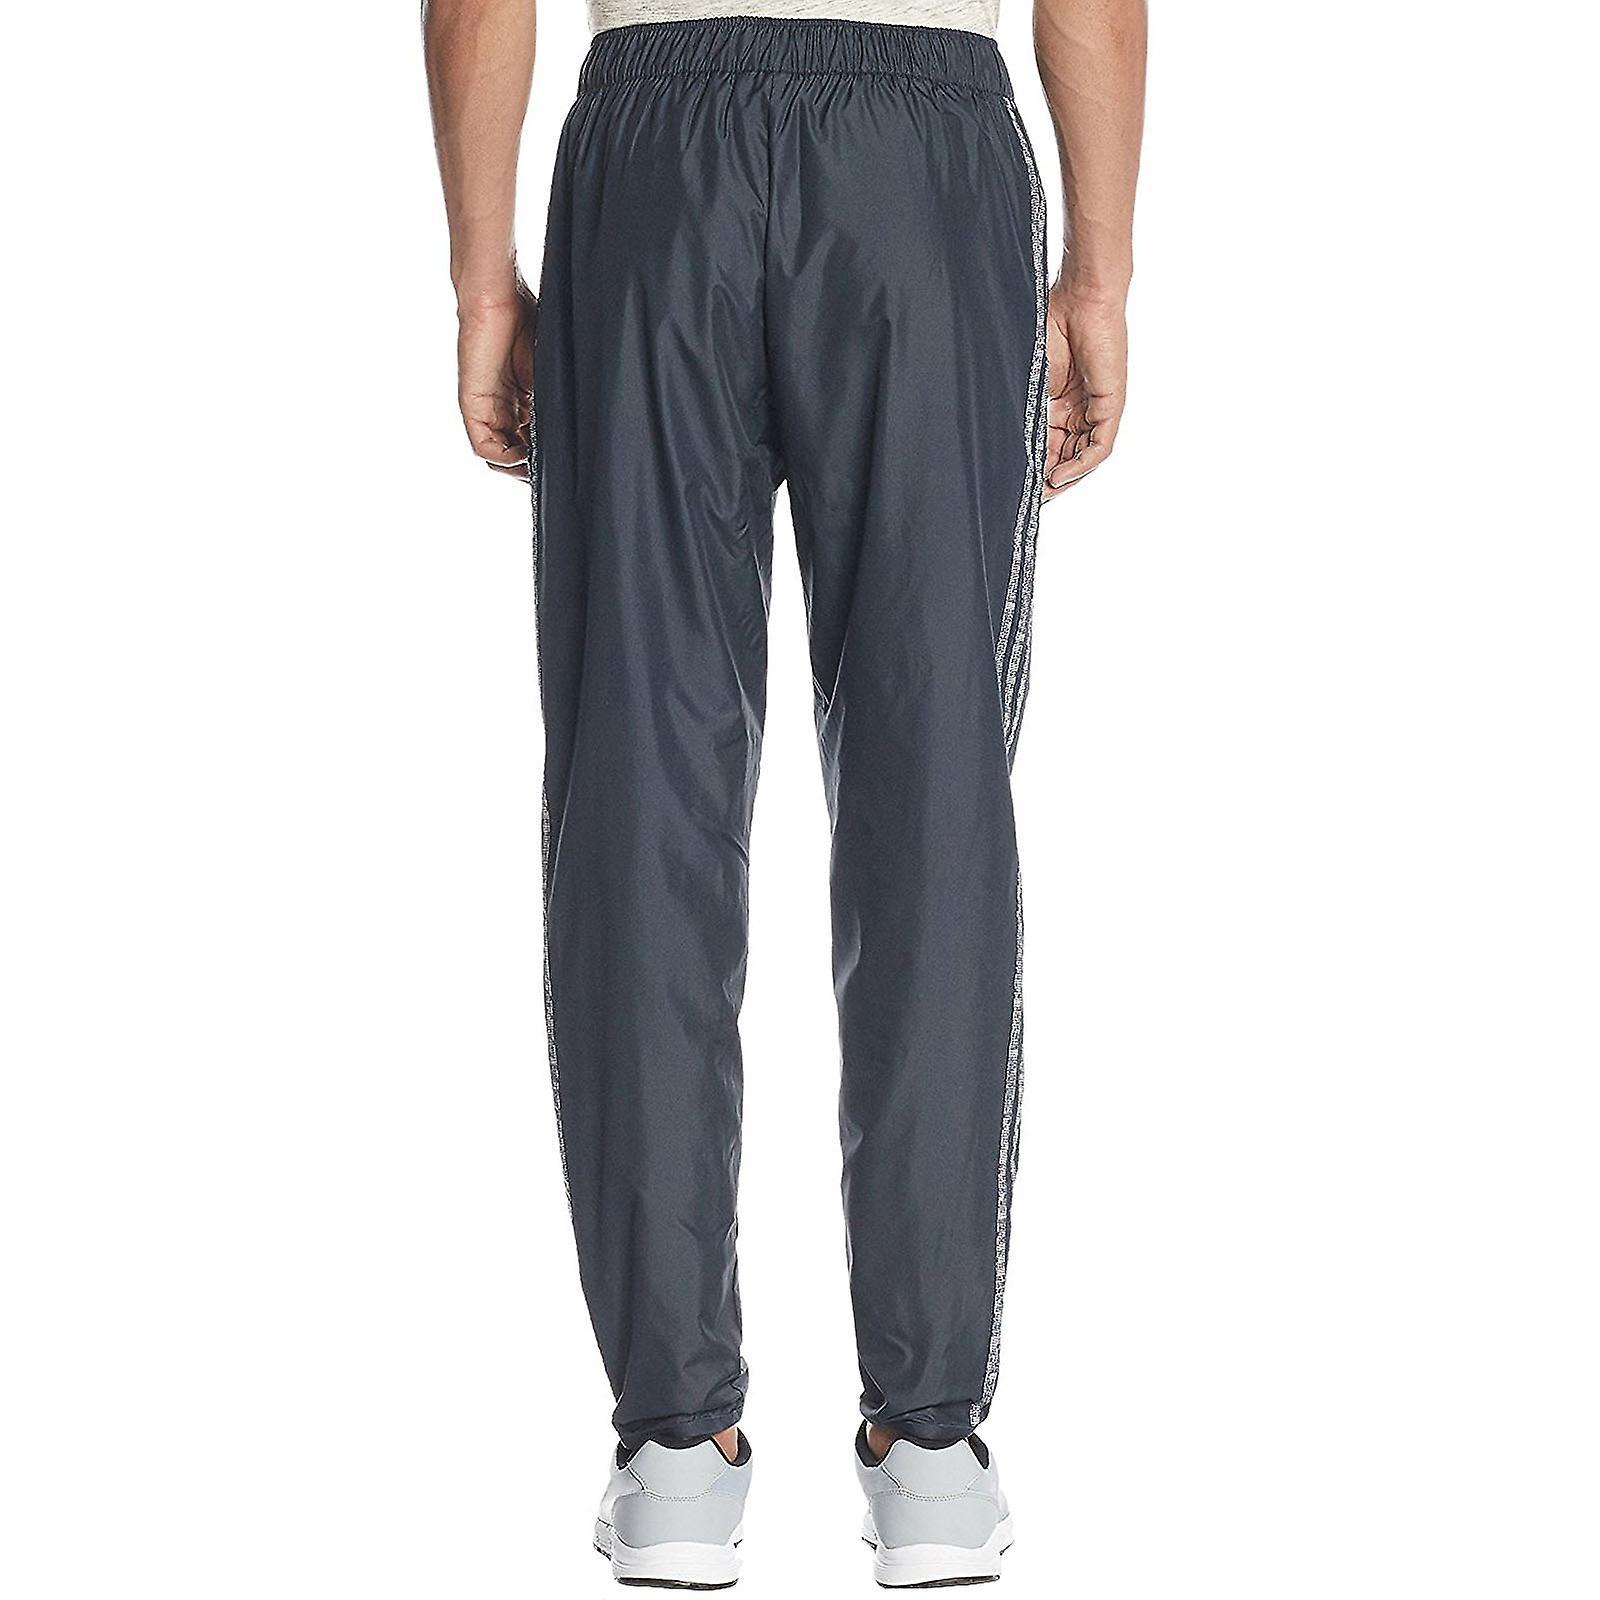 Adidas Originals Herren Trefoil Windpant Trainingsanzug Bottoms Jogger Hose grau